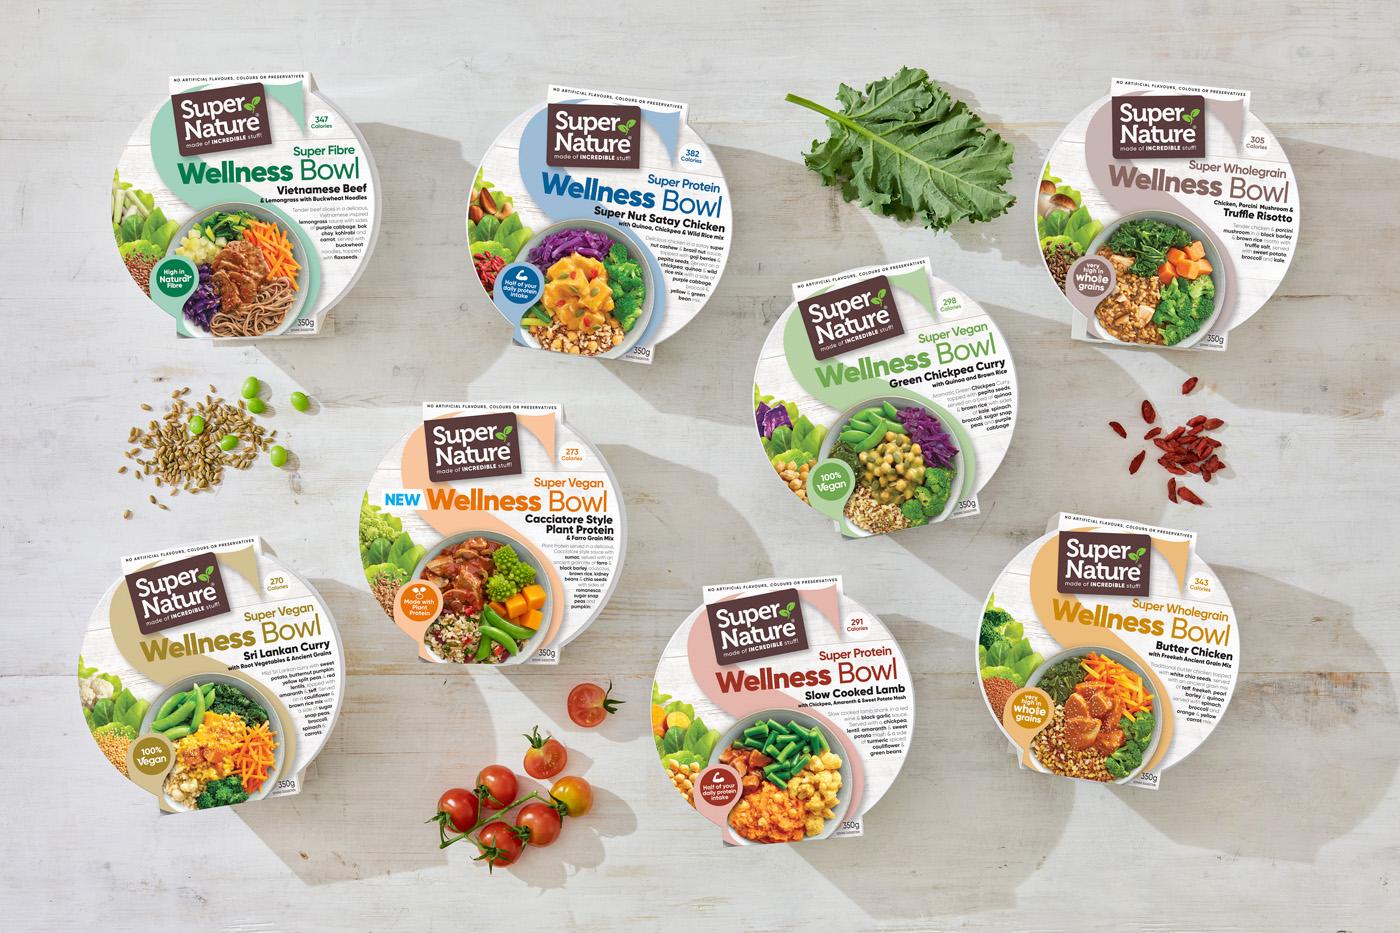 super nature wellness bowls